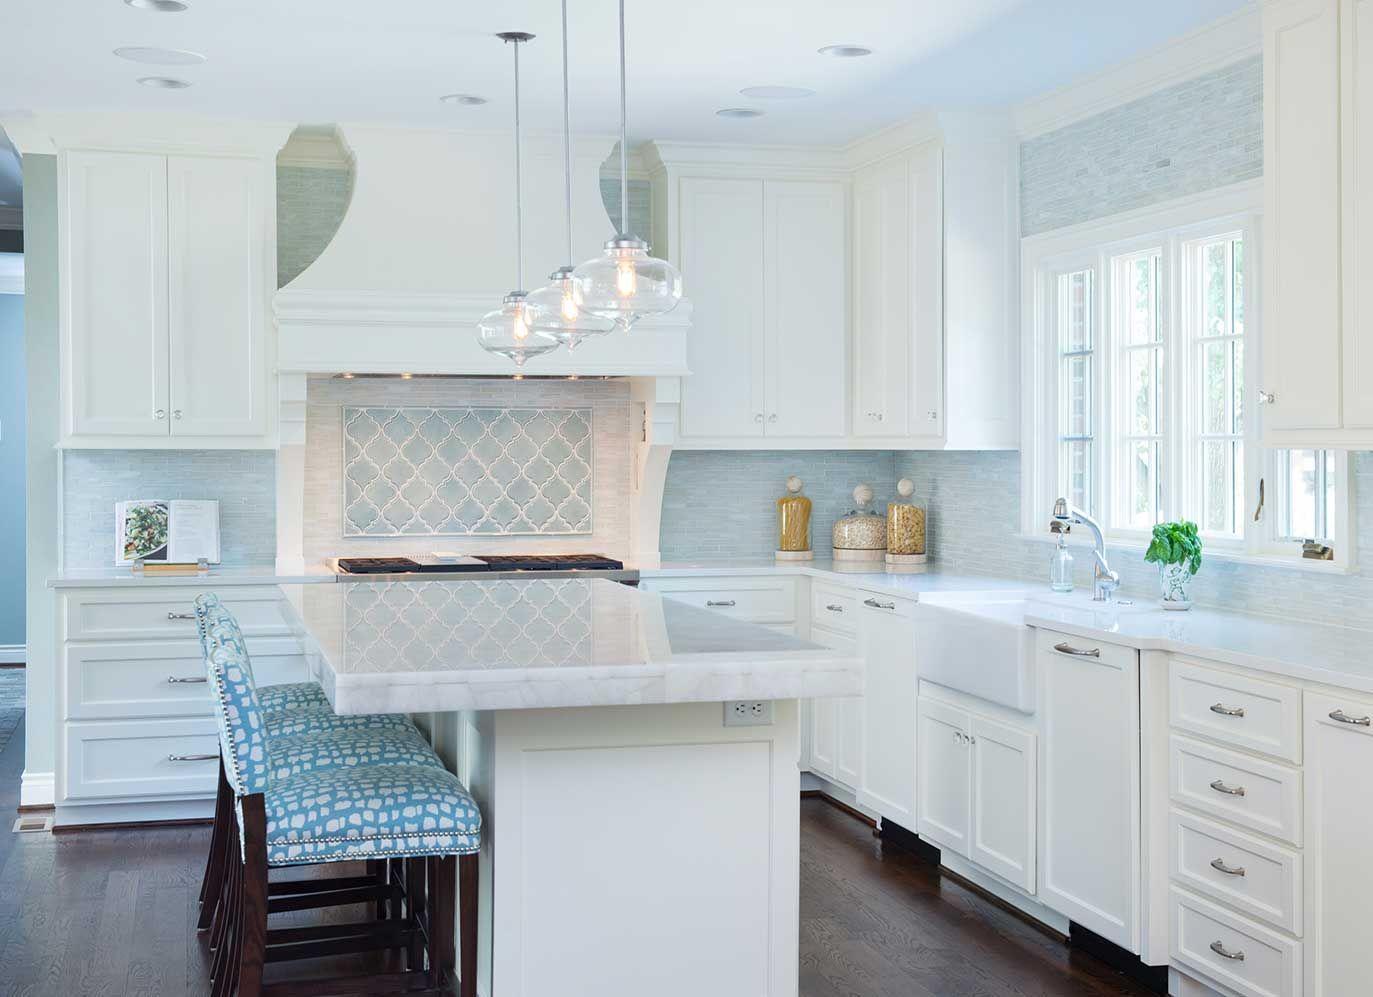 Shades Of Blue | Kitchens | Pinterest | Arabesque tile backsplash ...